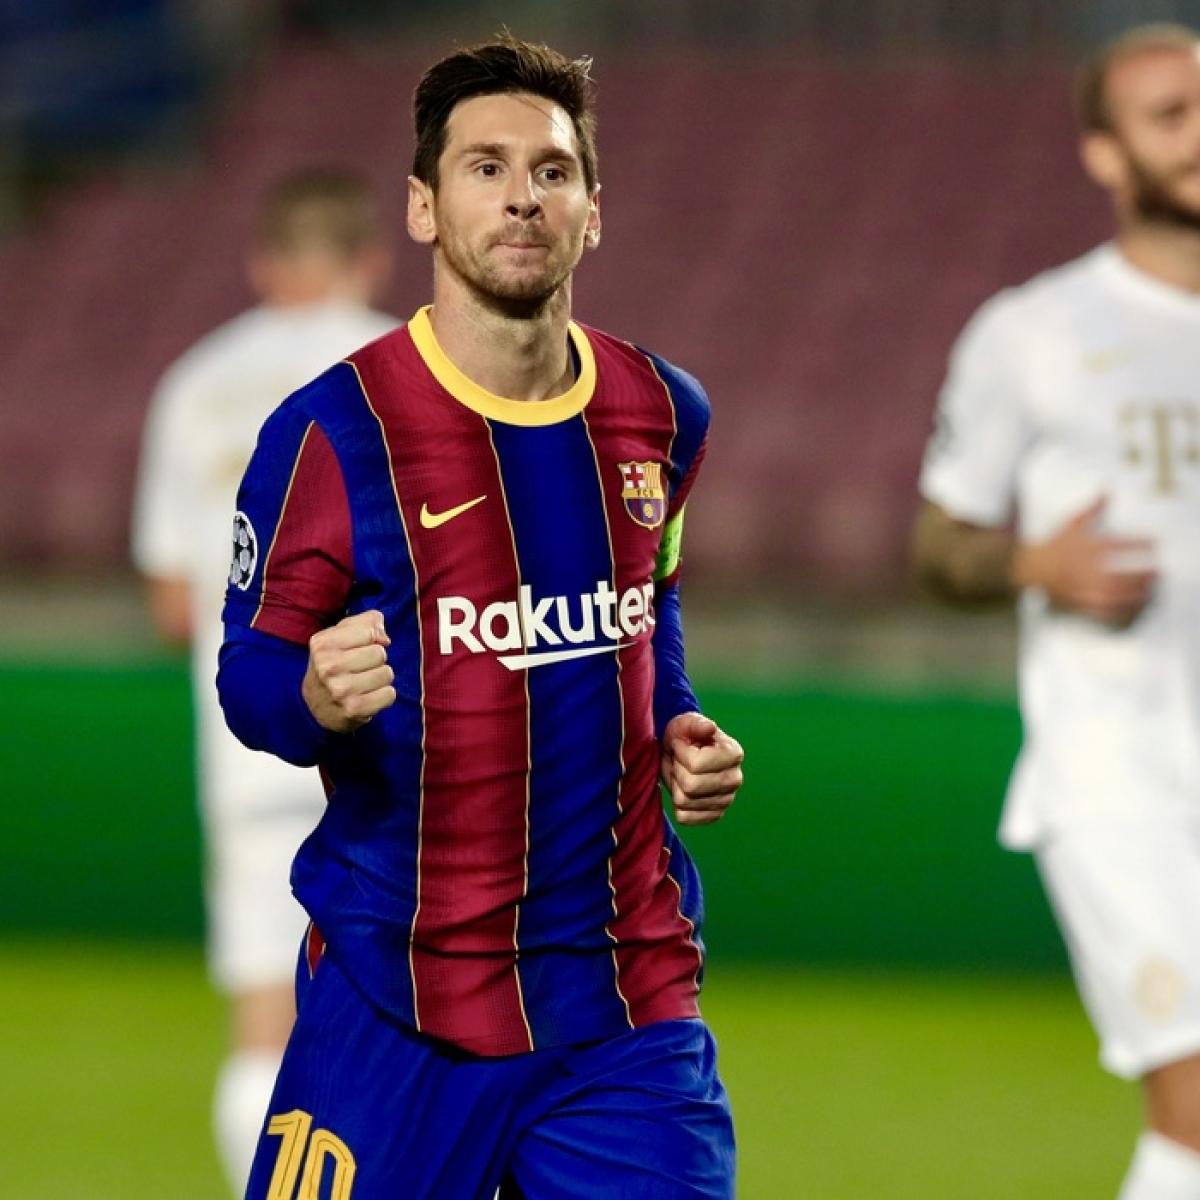 Champions League: Lionel Messi achieves new milestone as Barcelona defeat Ferencvaros